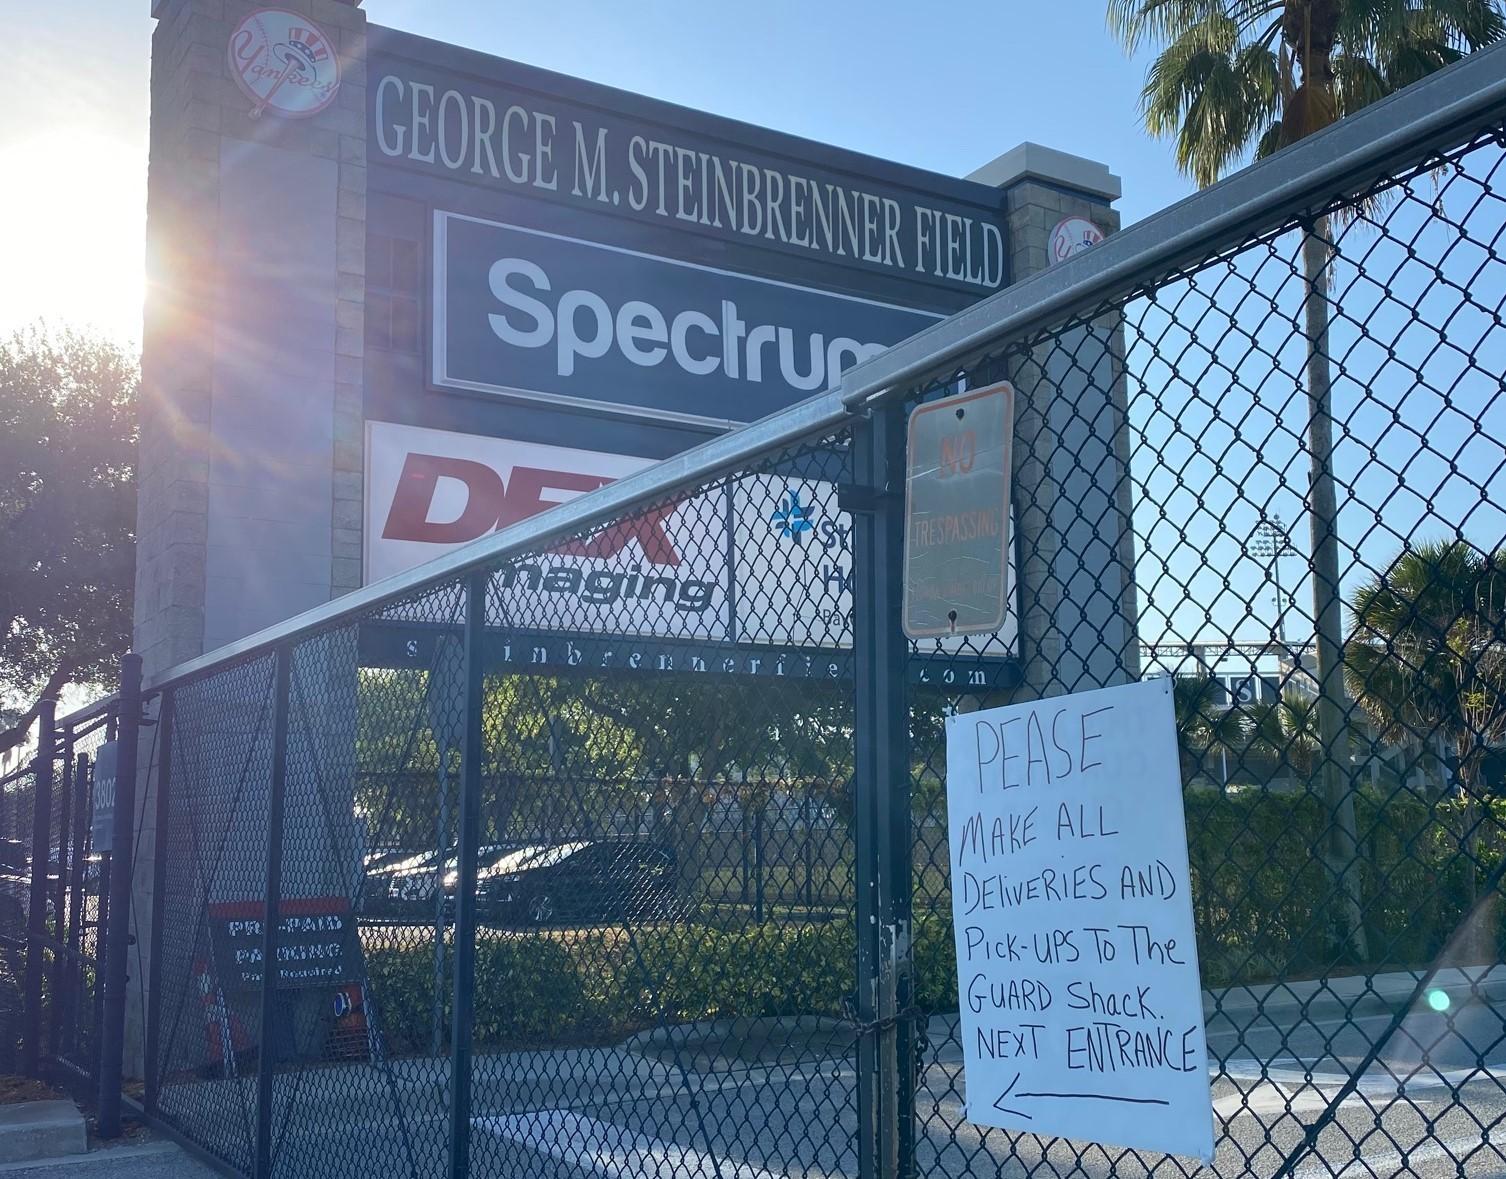 DJ LeMahieu's, Aaron Judge's sanctuary at Yankees spring facility in jeopardy amid coronavirus shutdowns